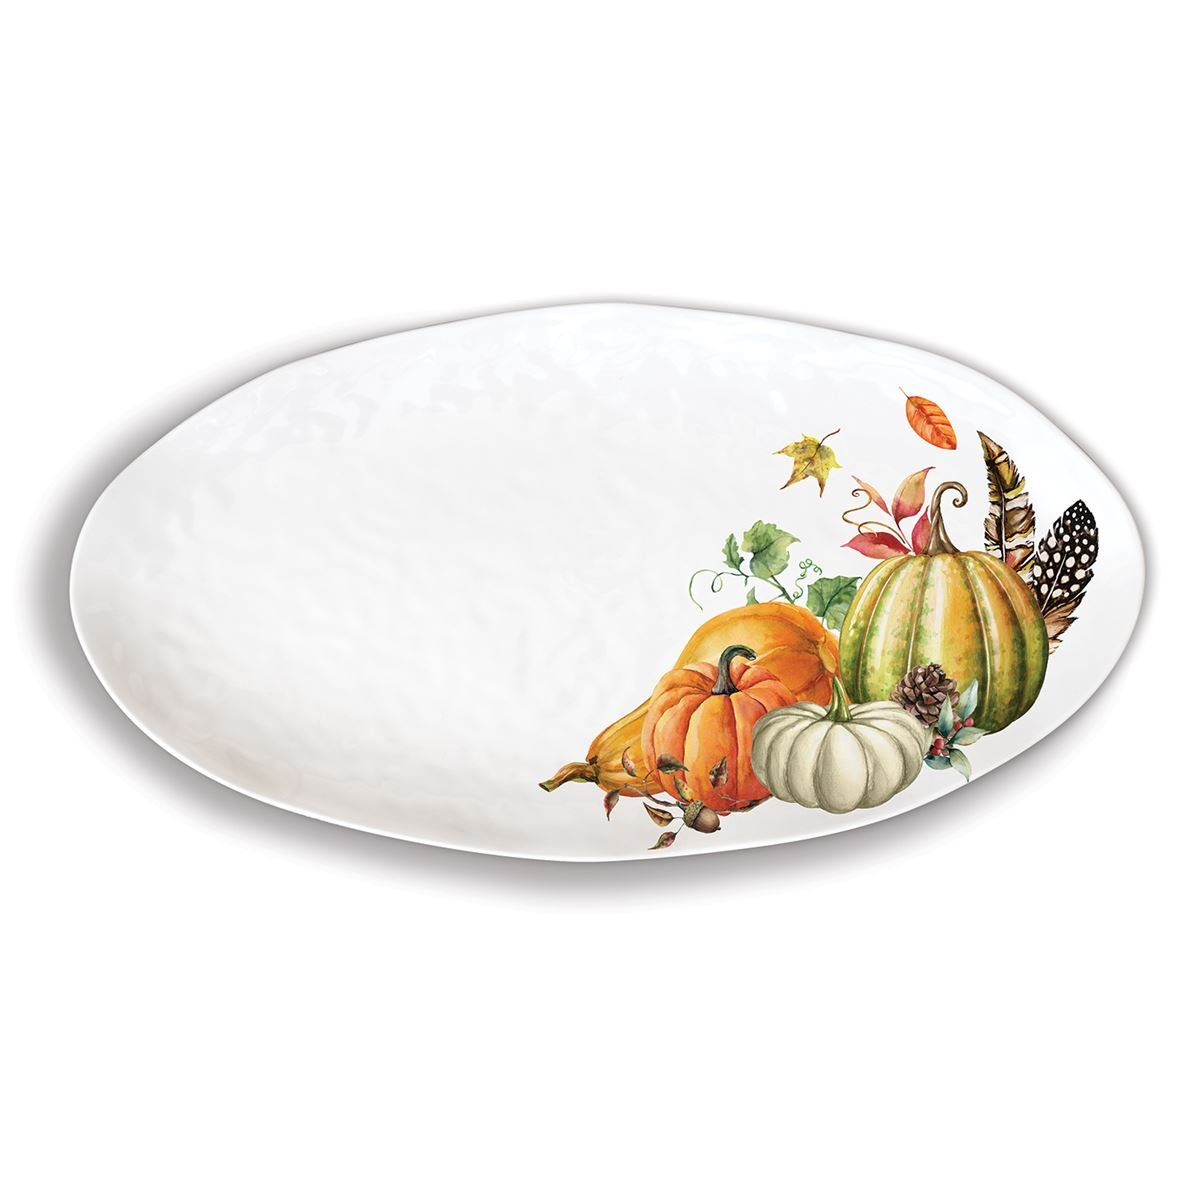 Sweet Pumpkin Melamine Serveware Oval Platter